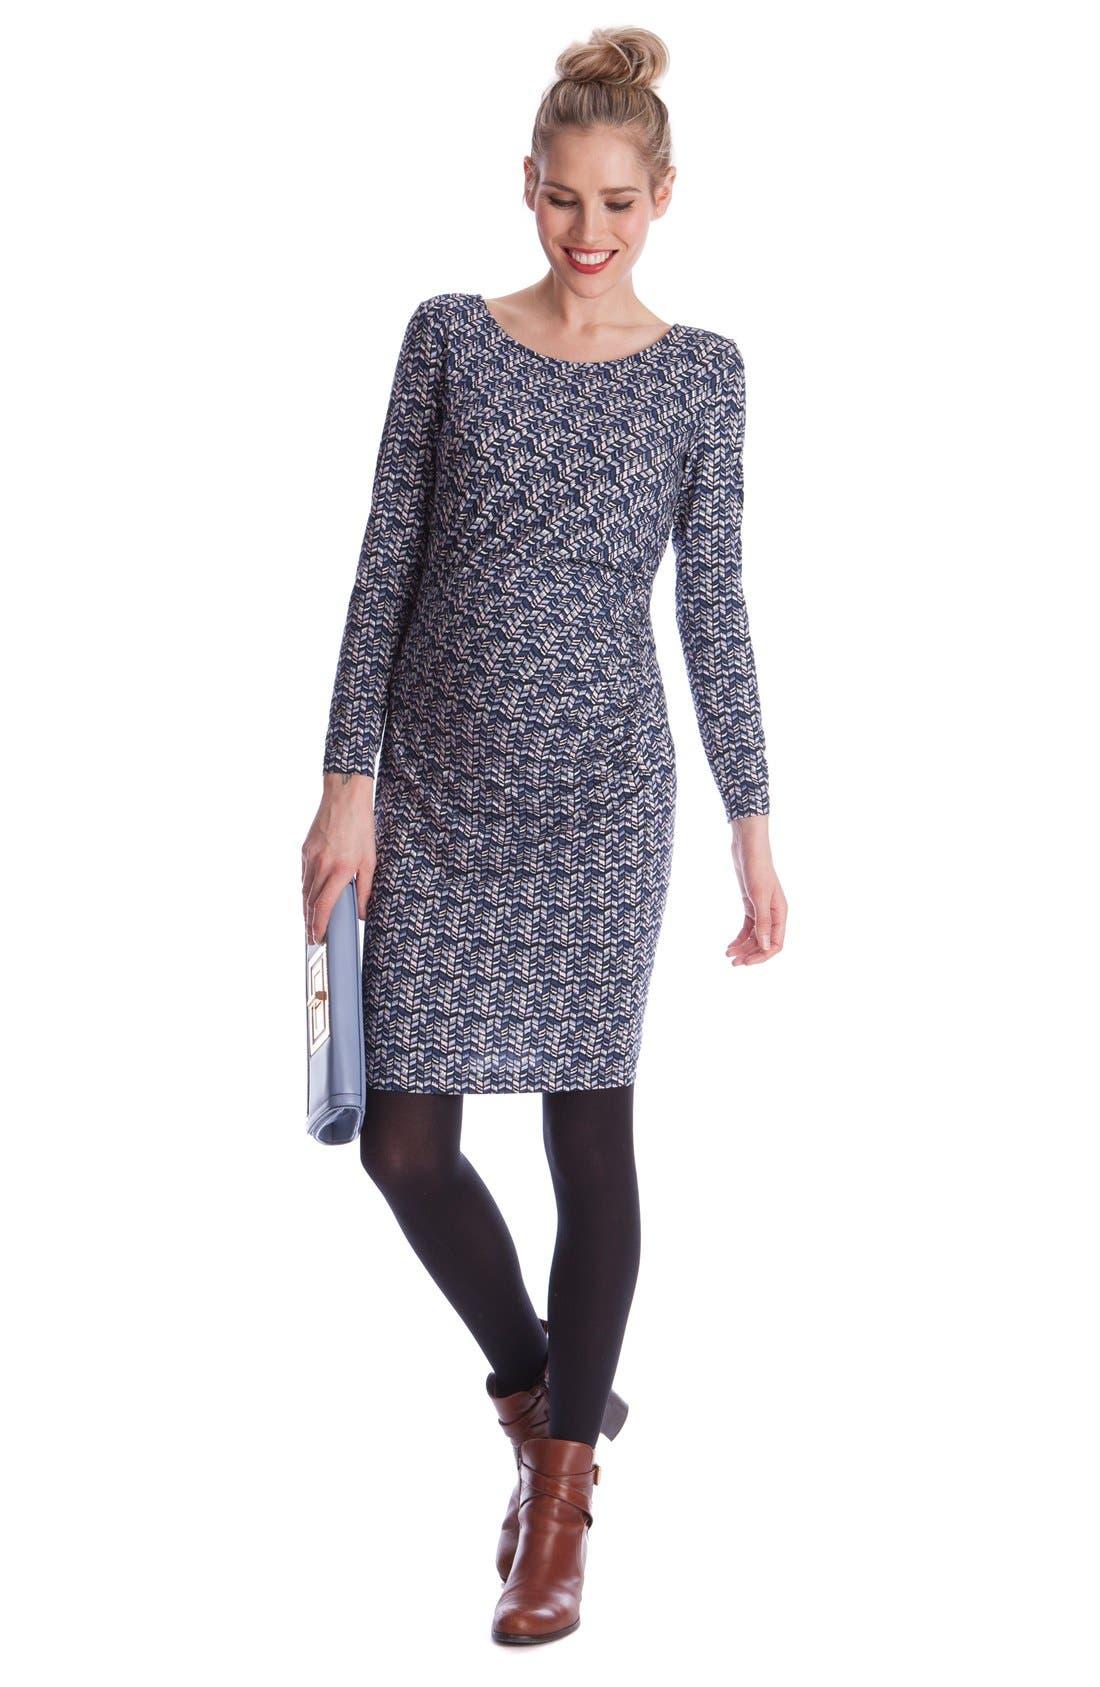 Main Image - Seraphine 'Cassie' Ruched Chevron Print Maternity Dress